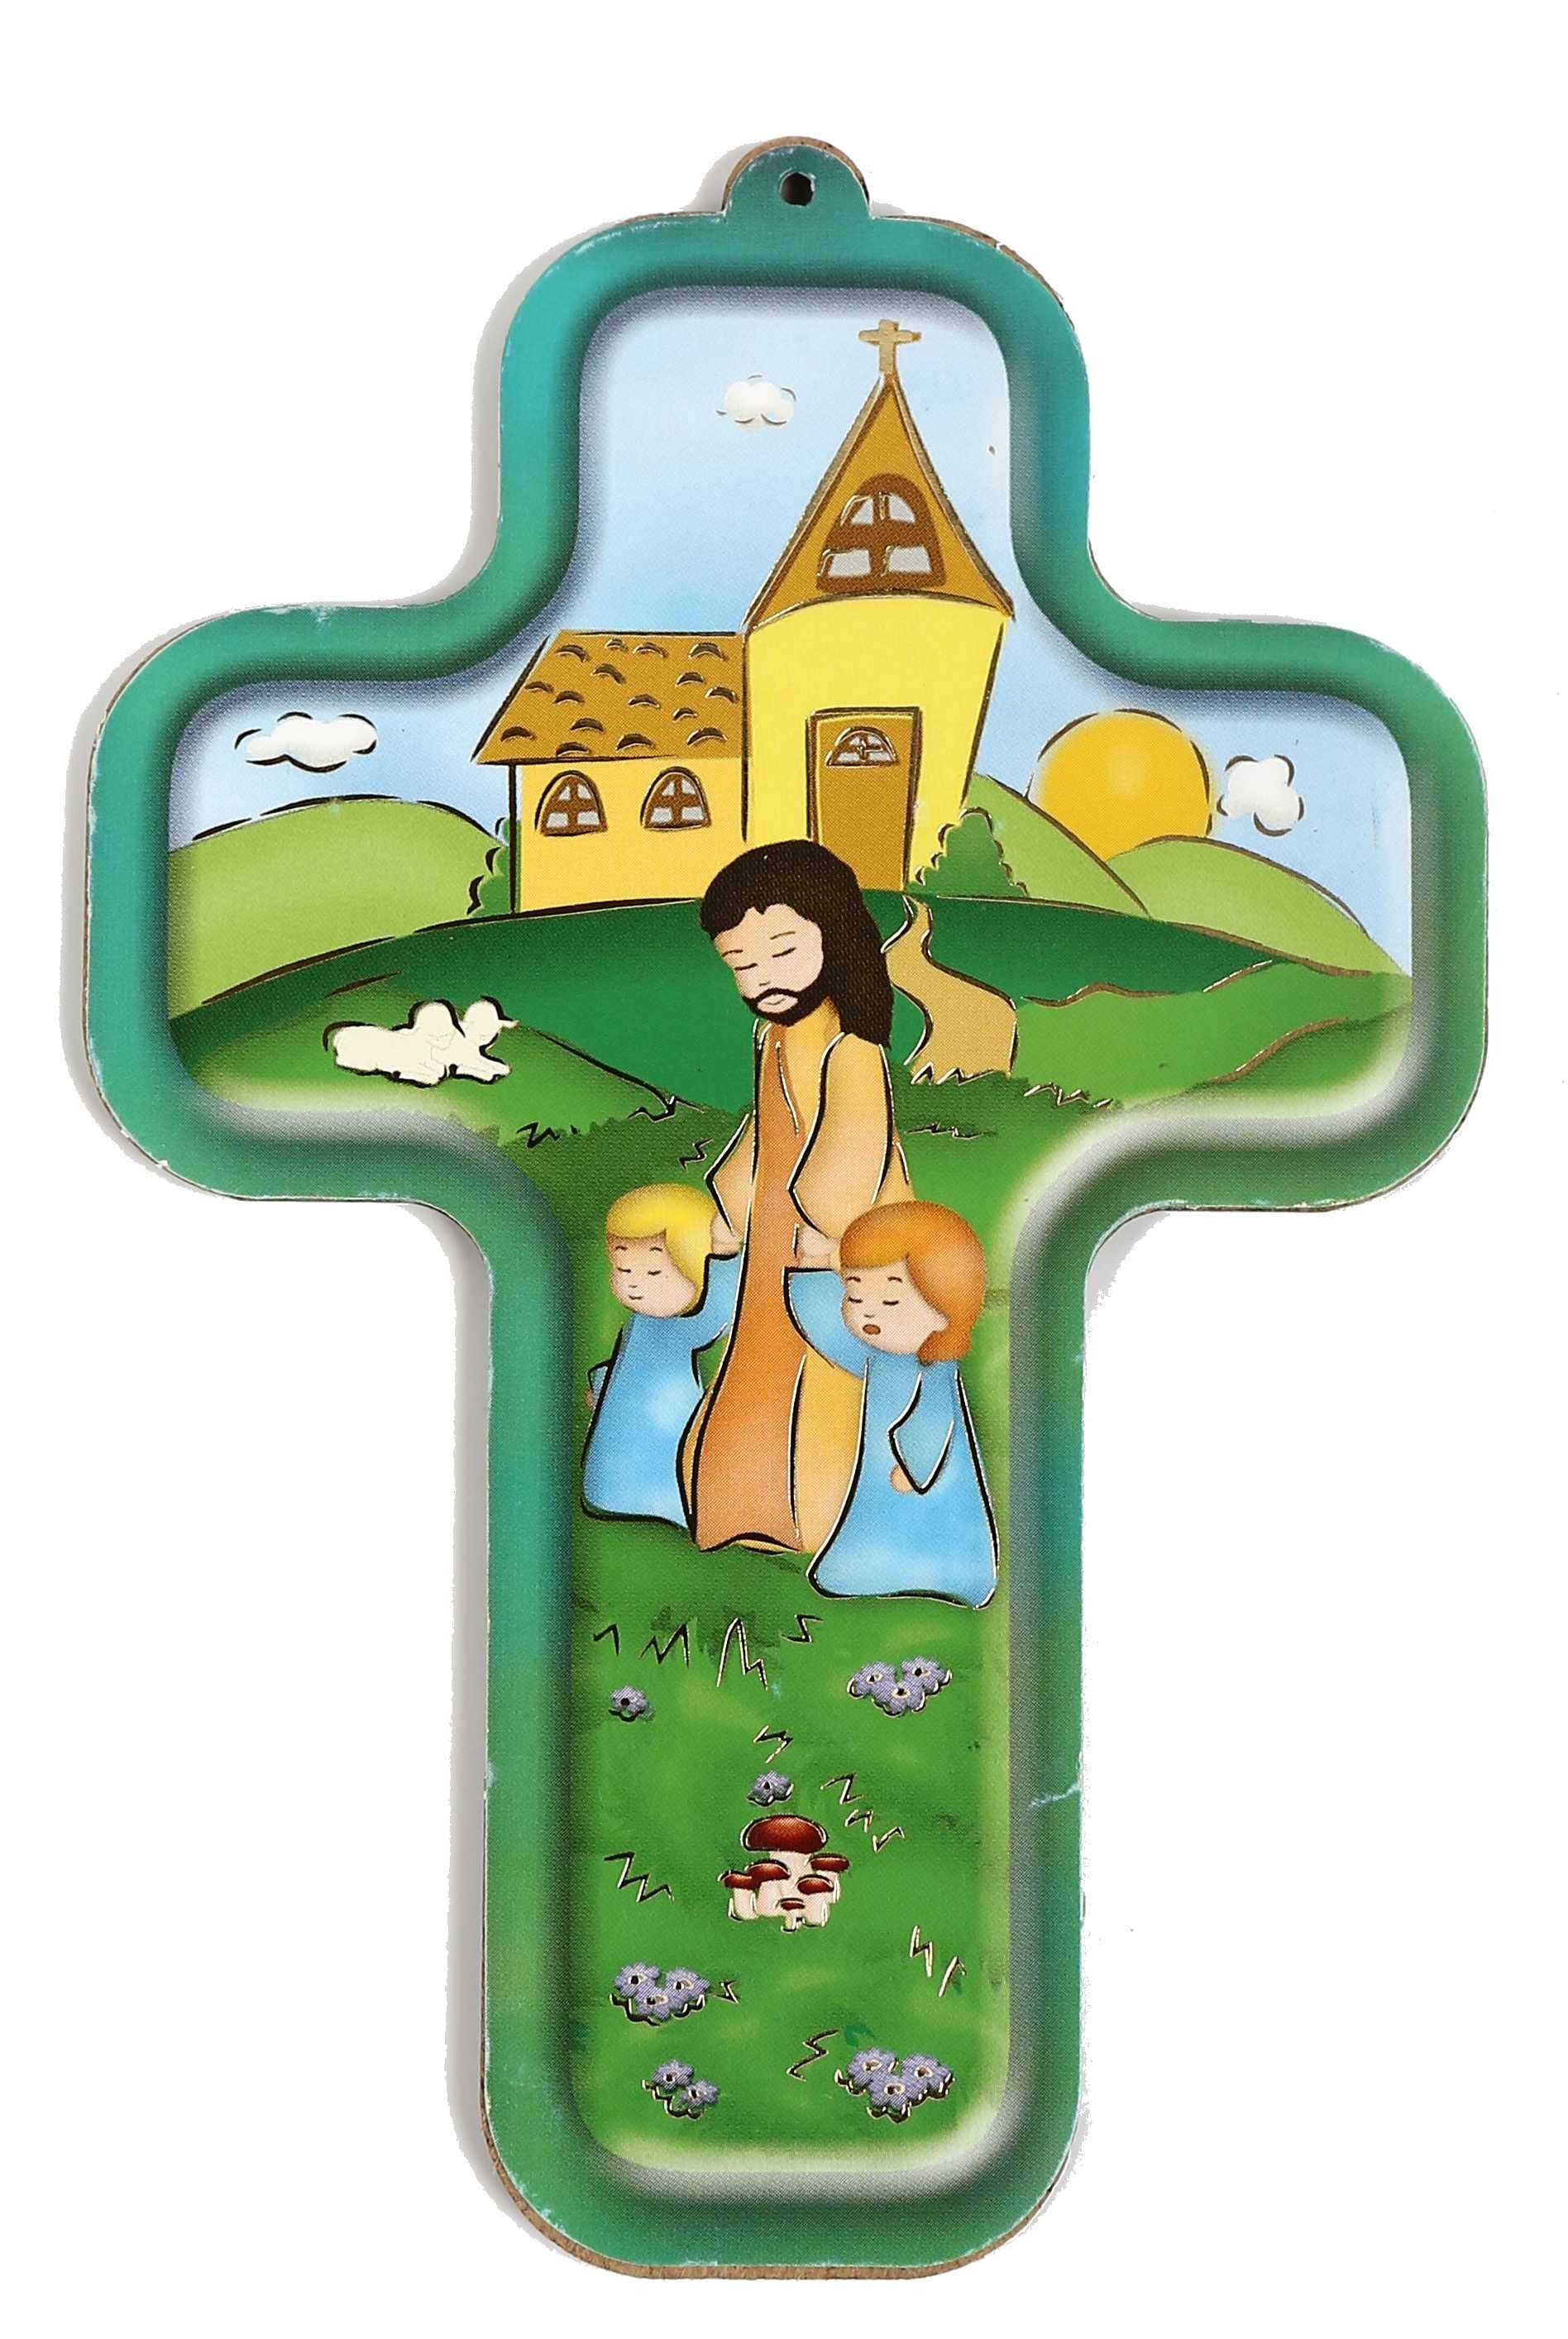 Croix enfantine - Tendresse paternelle